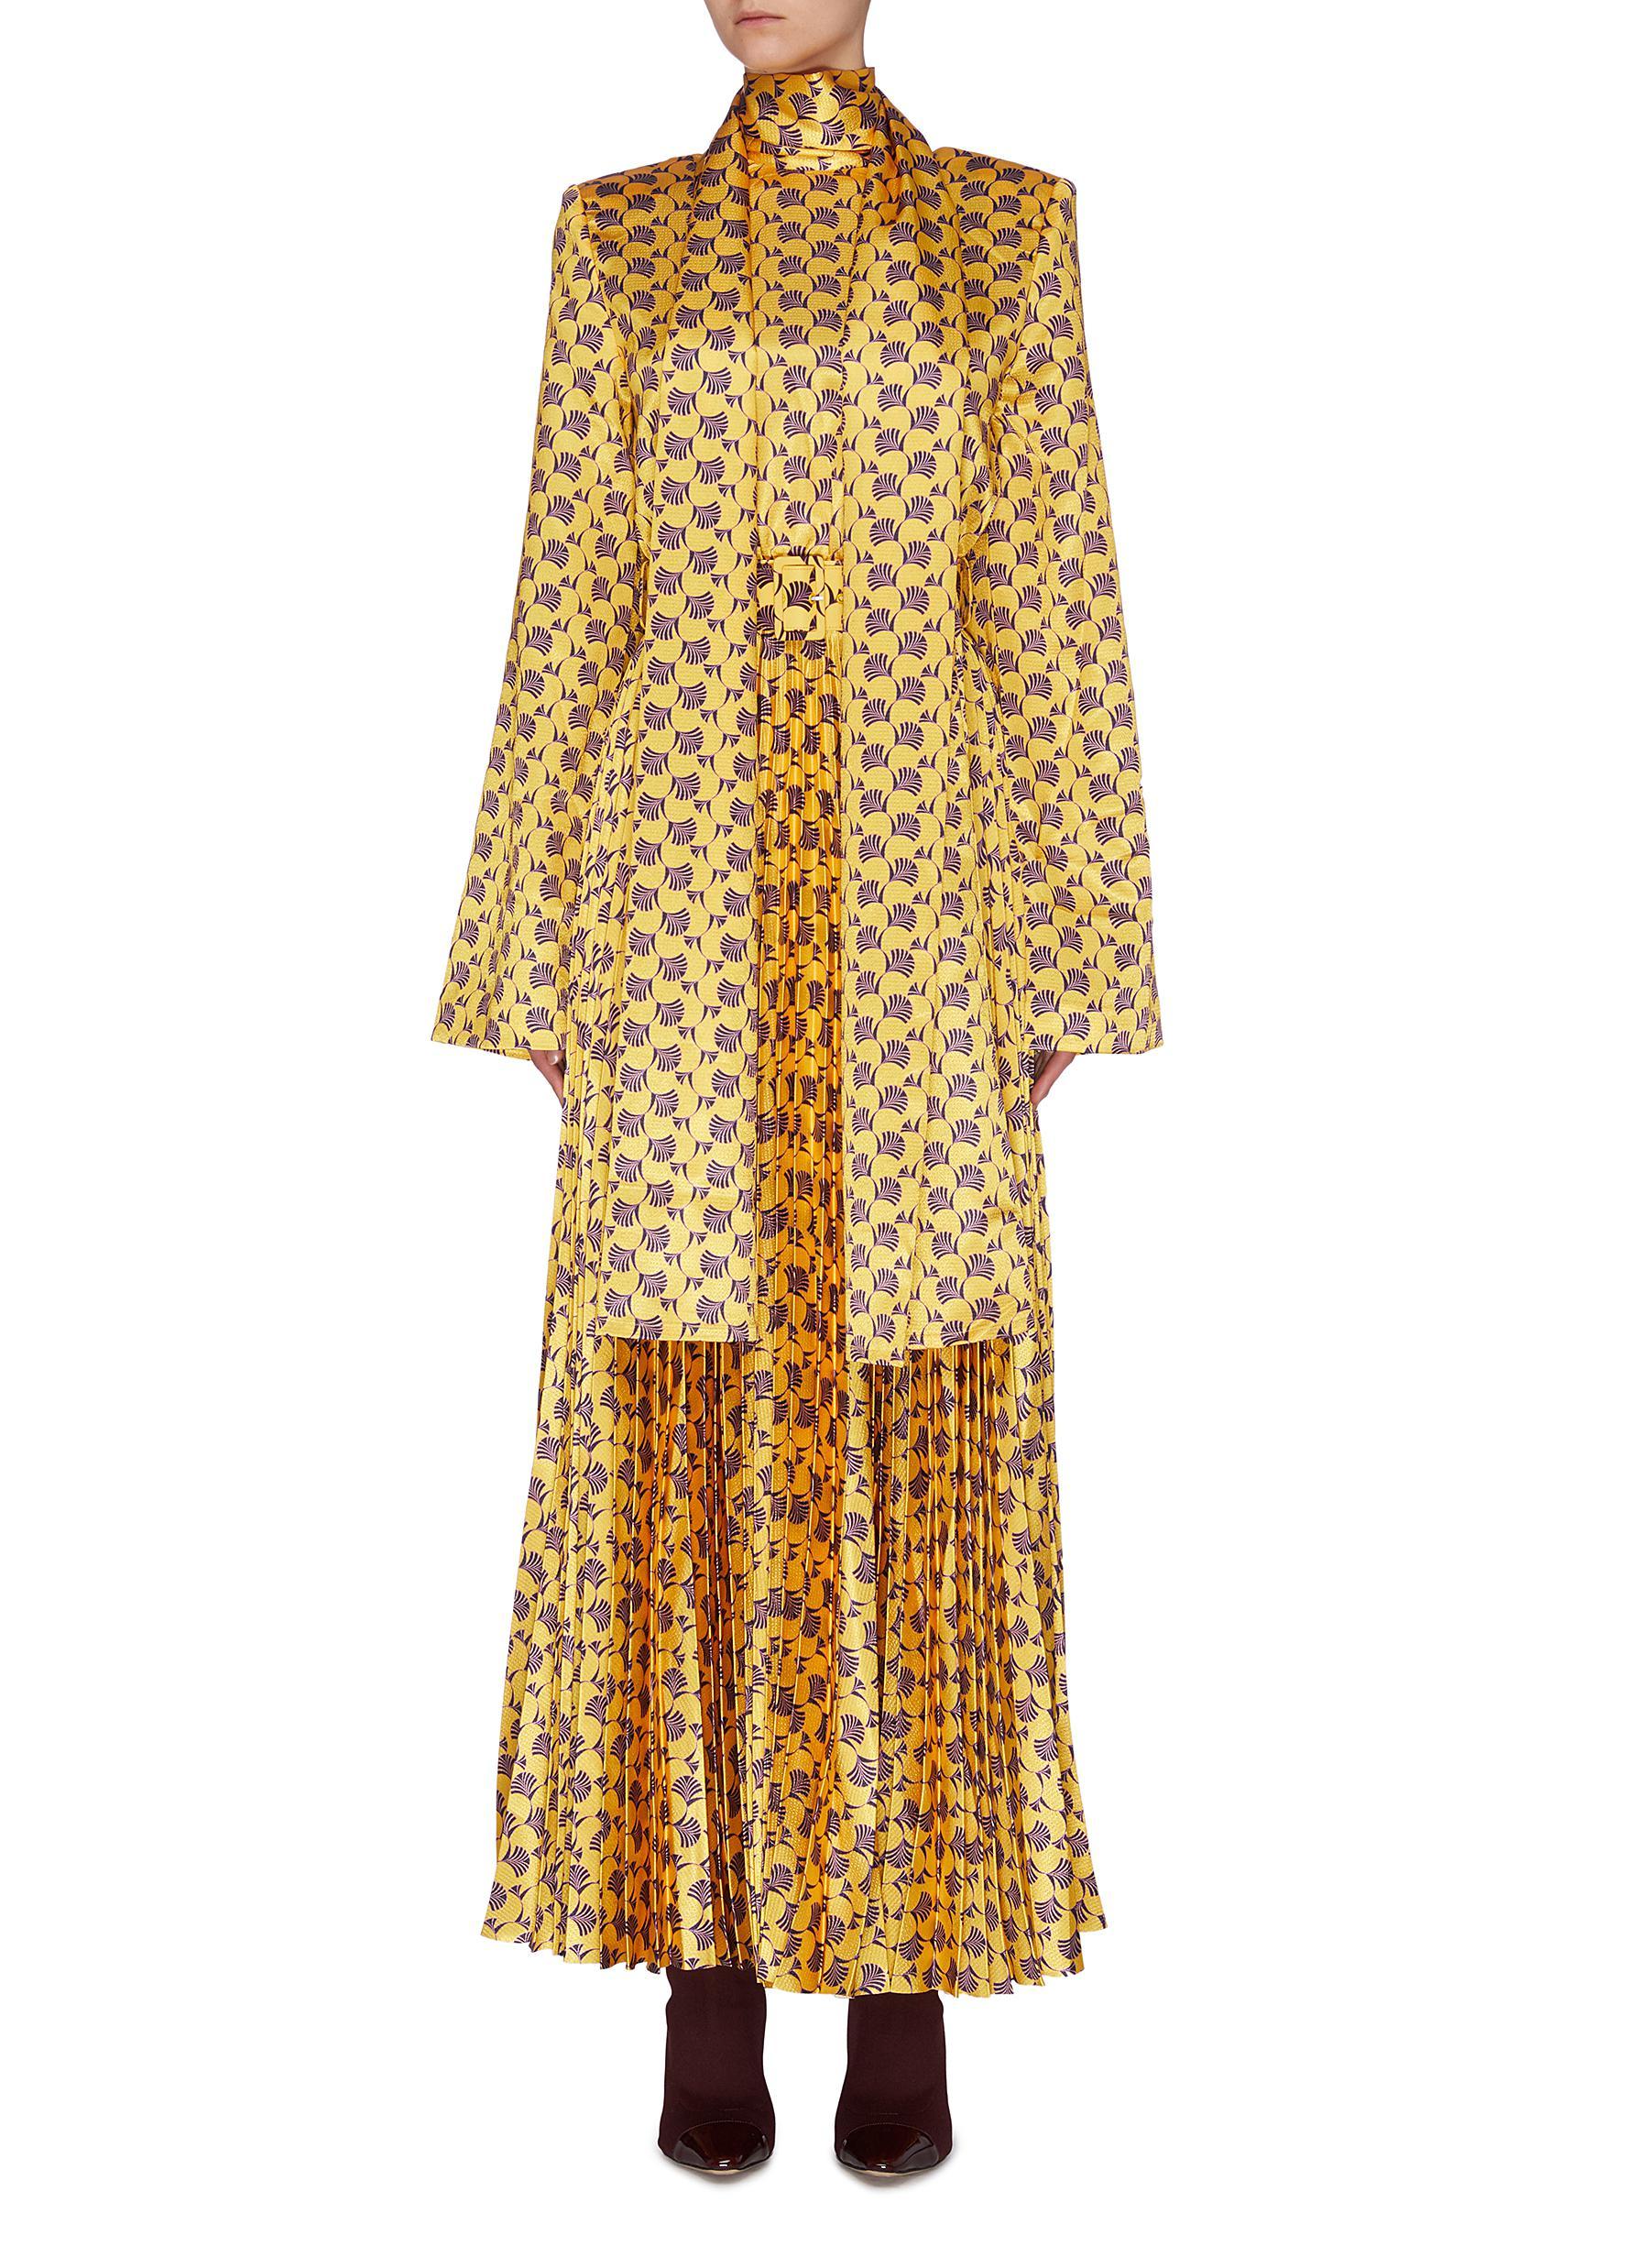 Buy Solace London Dresses 'Elin' graphic print neck tie maxi dress